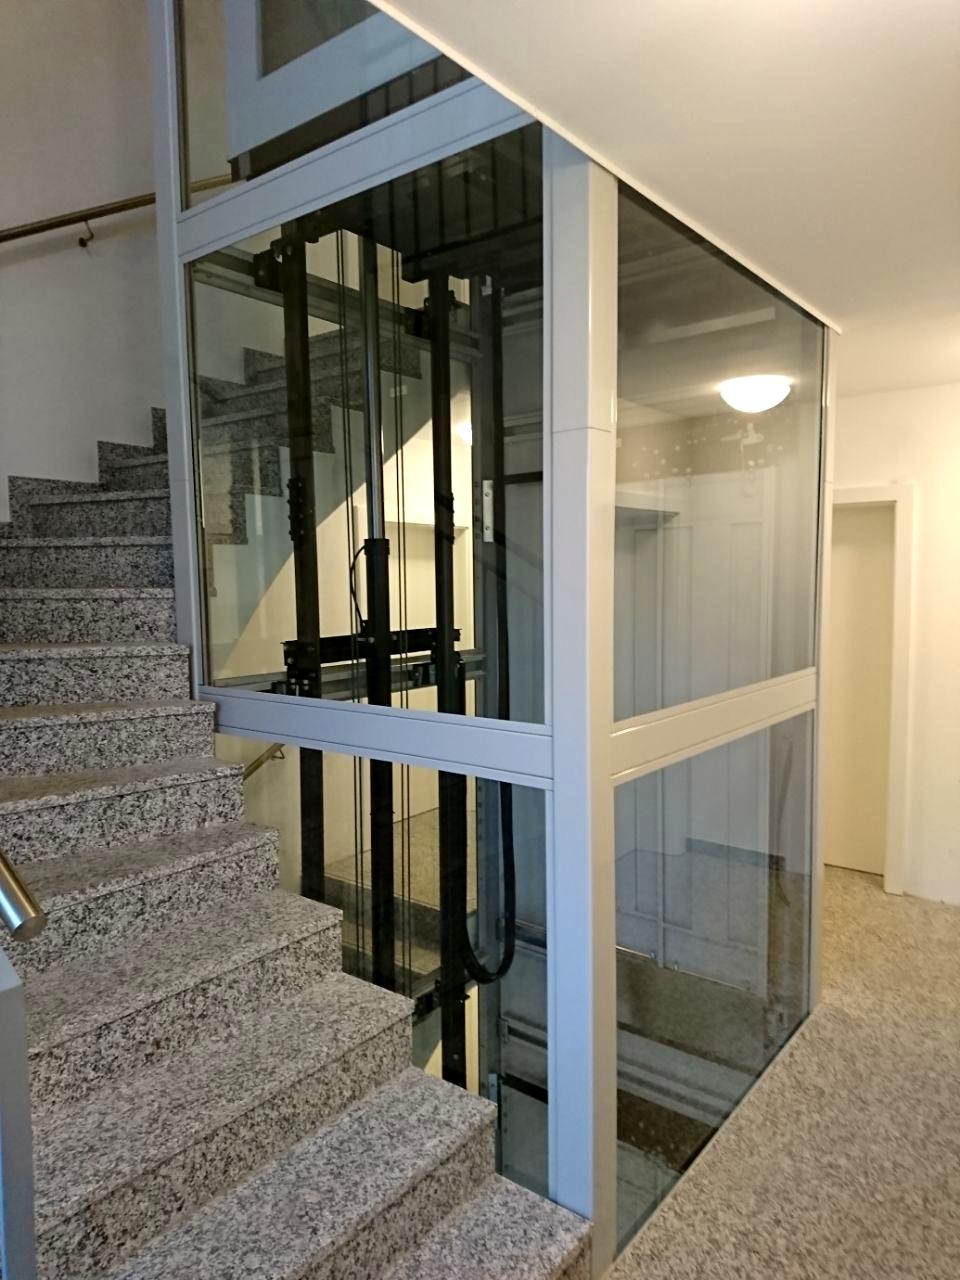 Homelift Lotte als Fahrstuhl im Treppenauge eines Mehrfamilienhauses